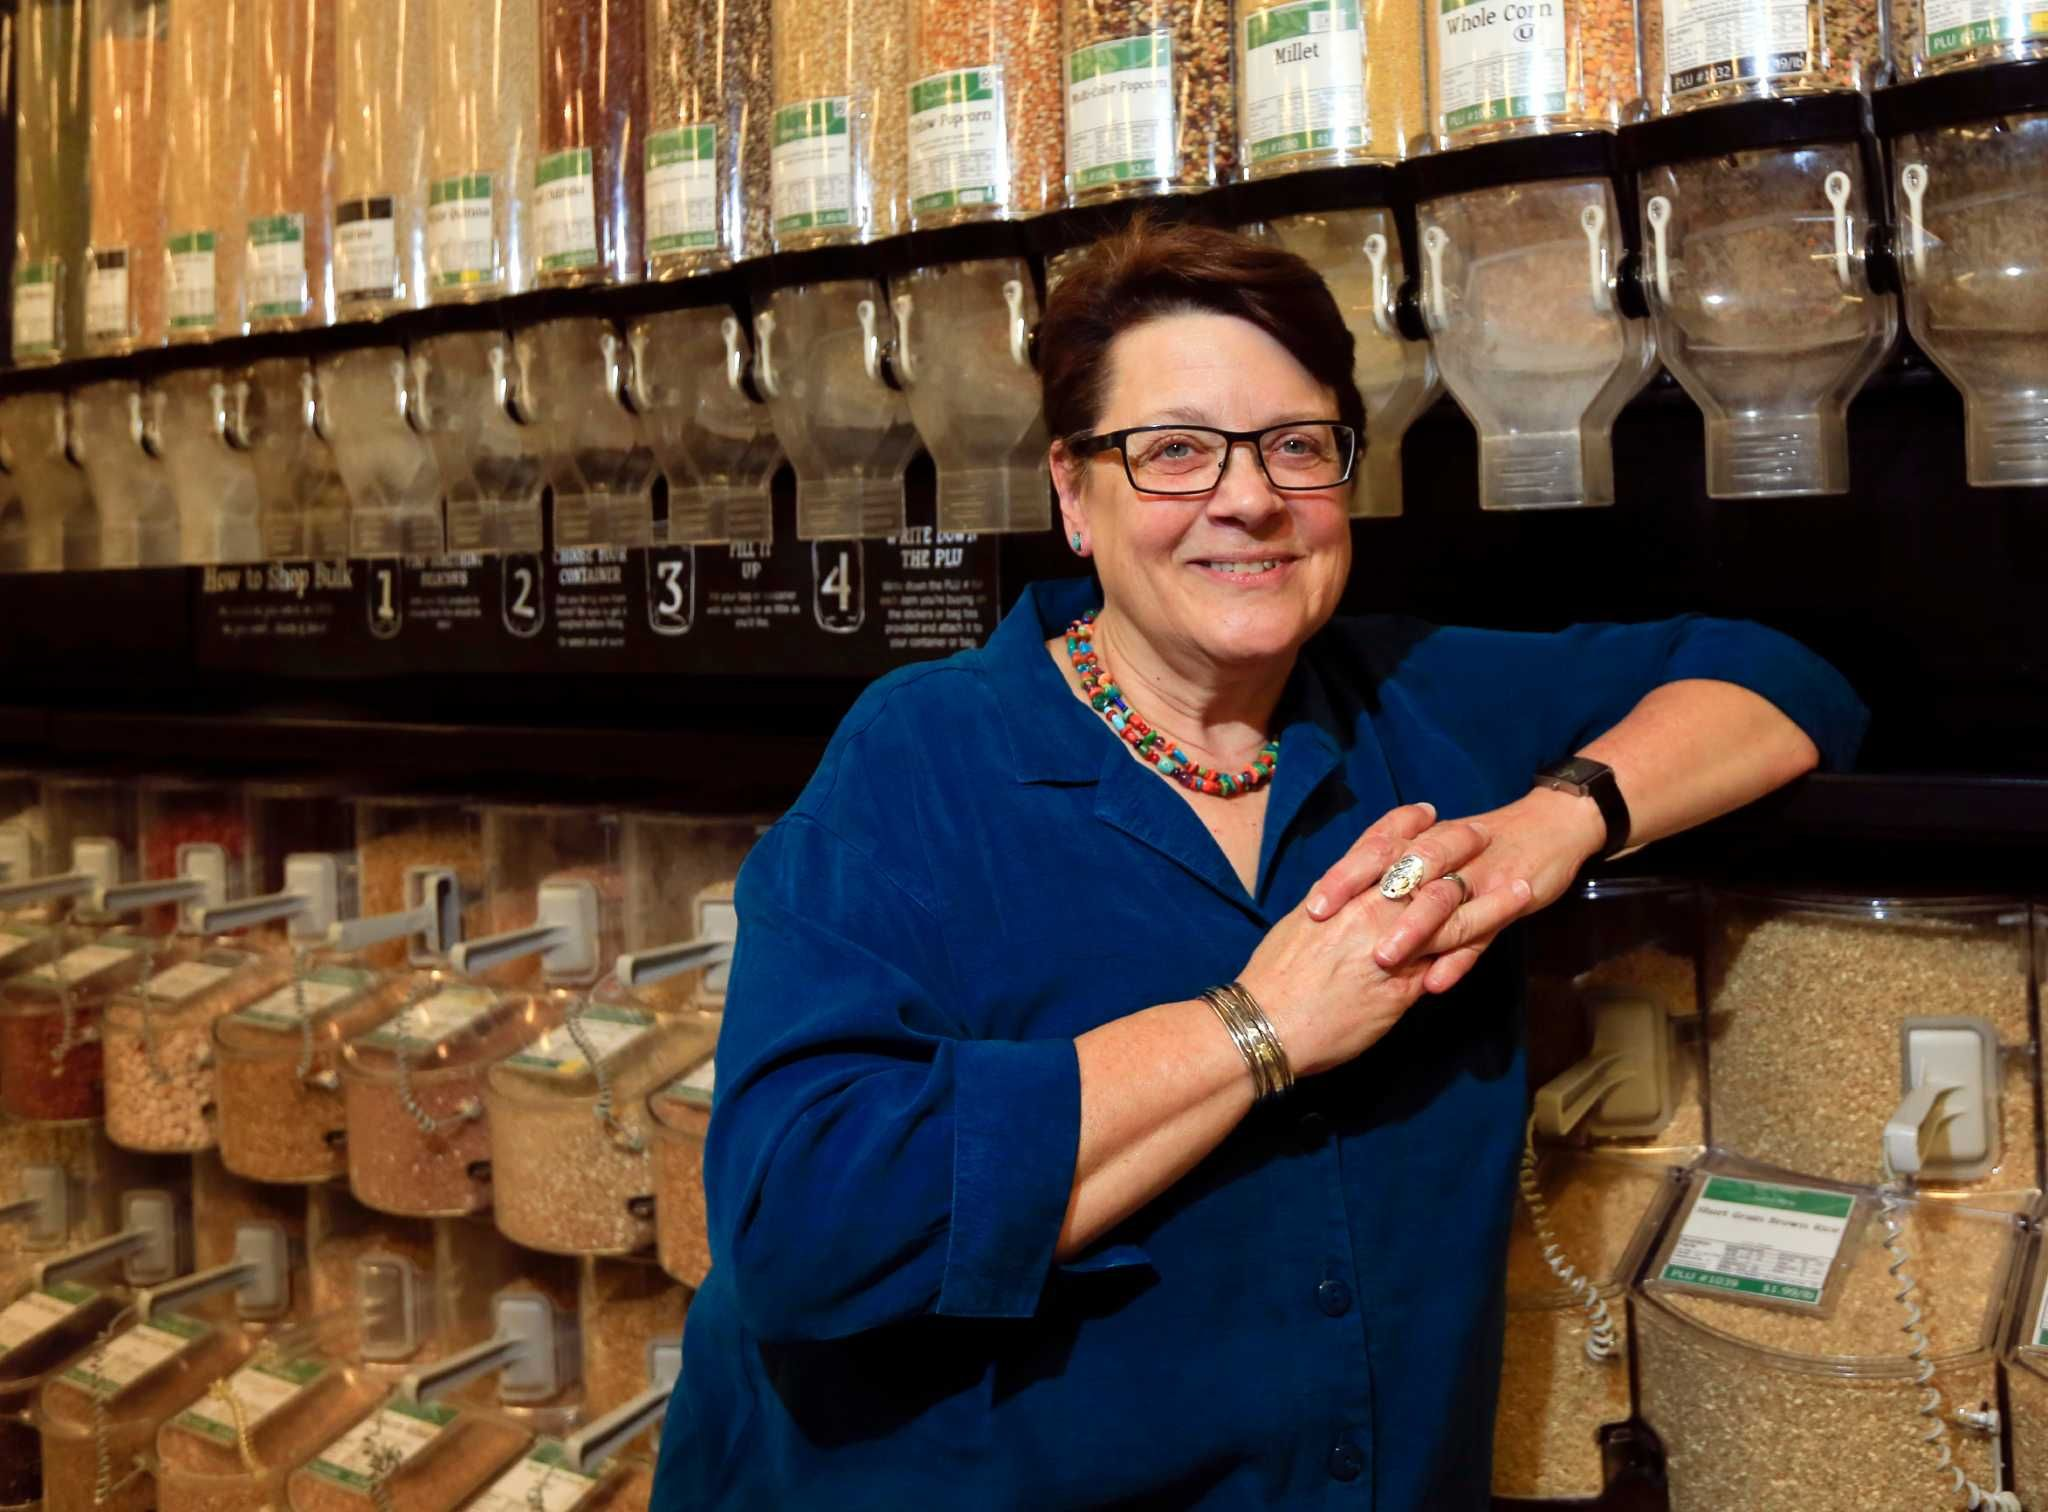 Albany ny ap food cooperative programs that allow